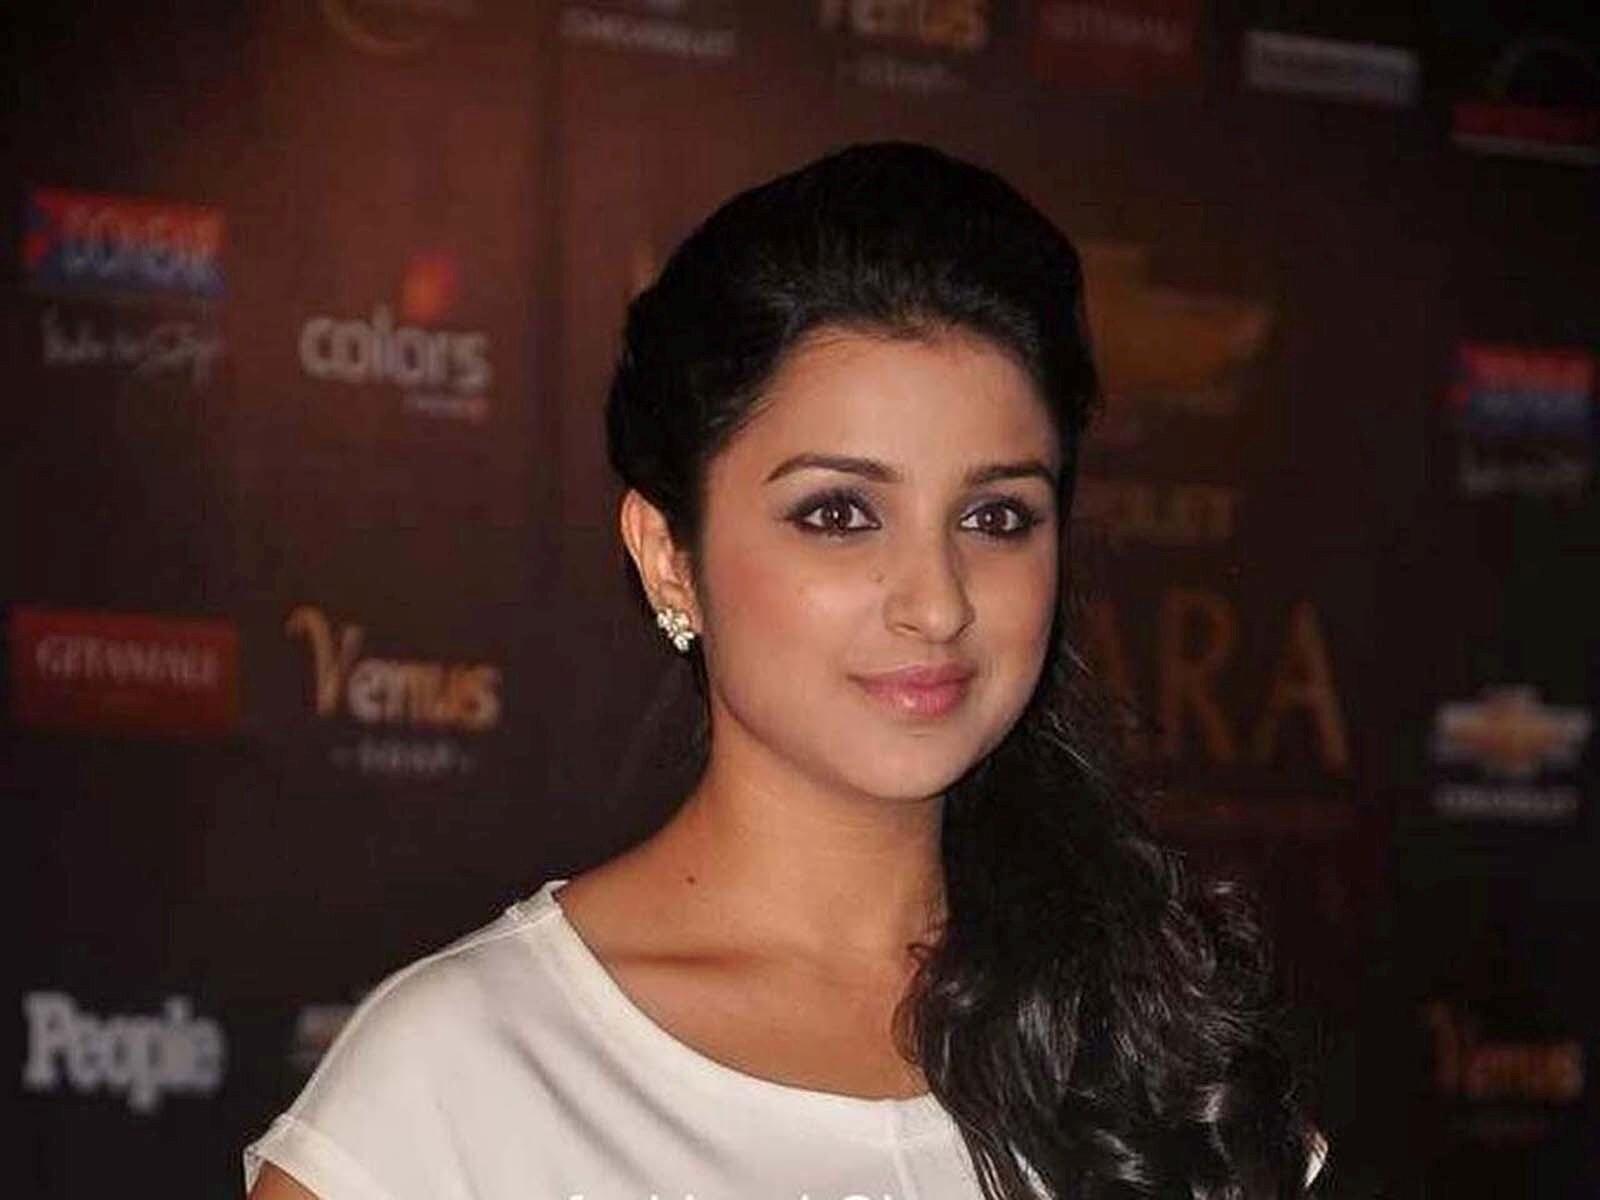 parineeti chopra cute bollywood actress | hd wallpapers